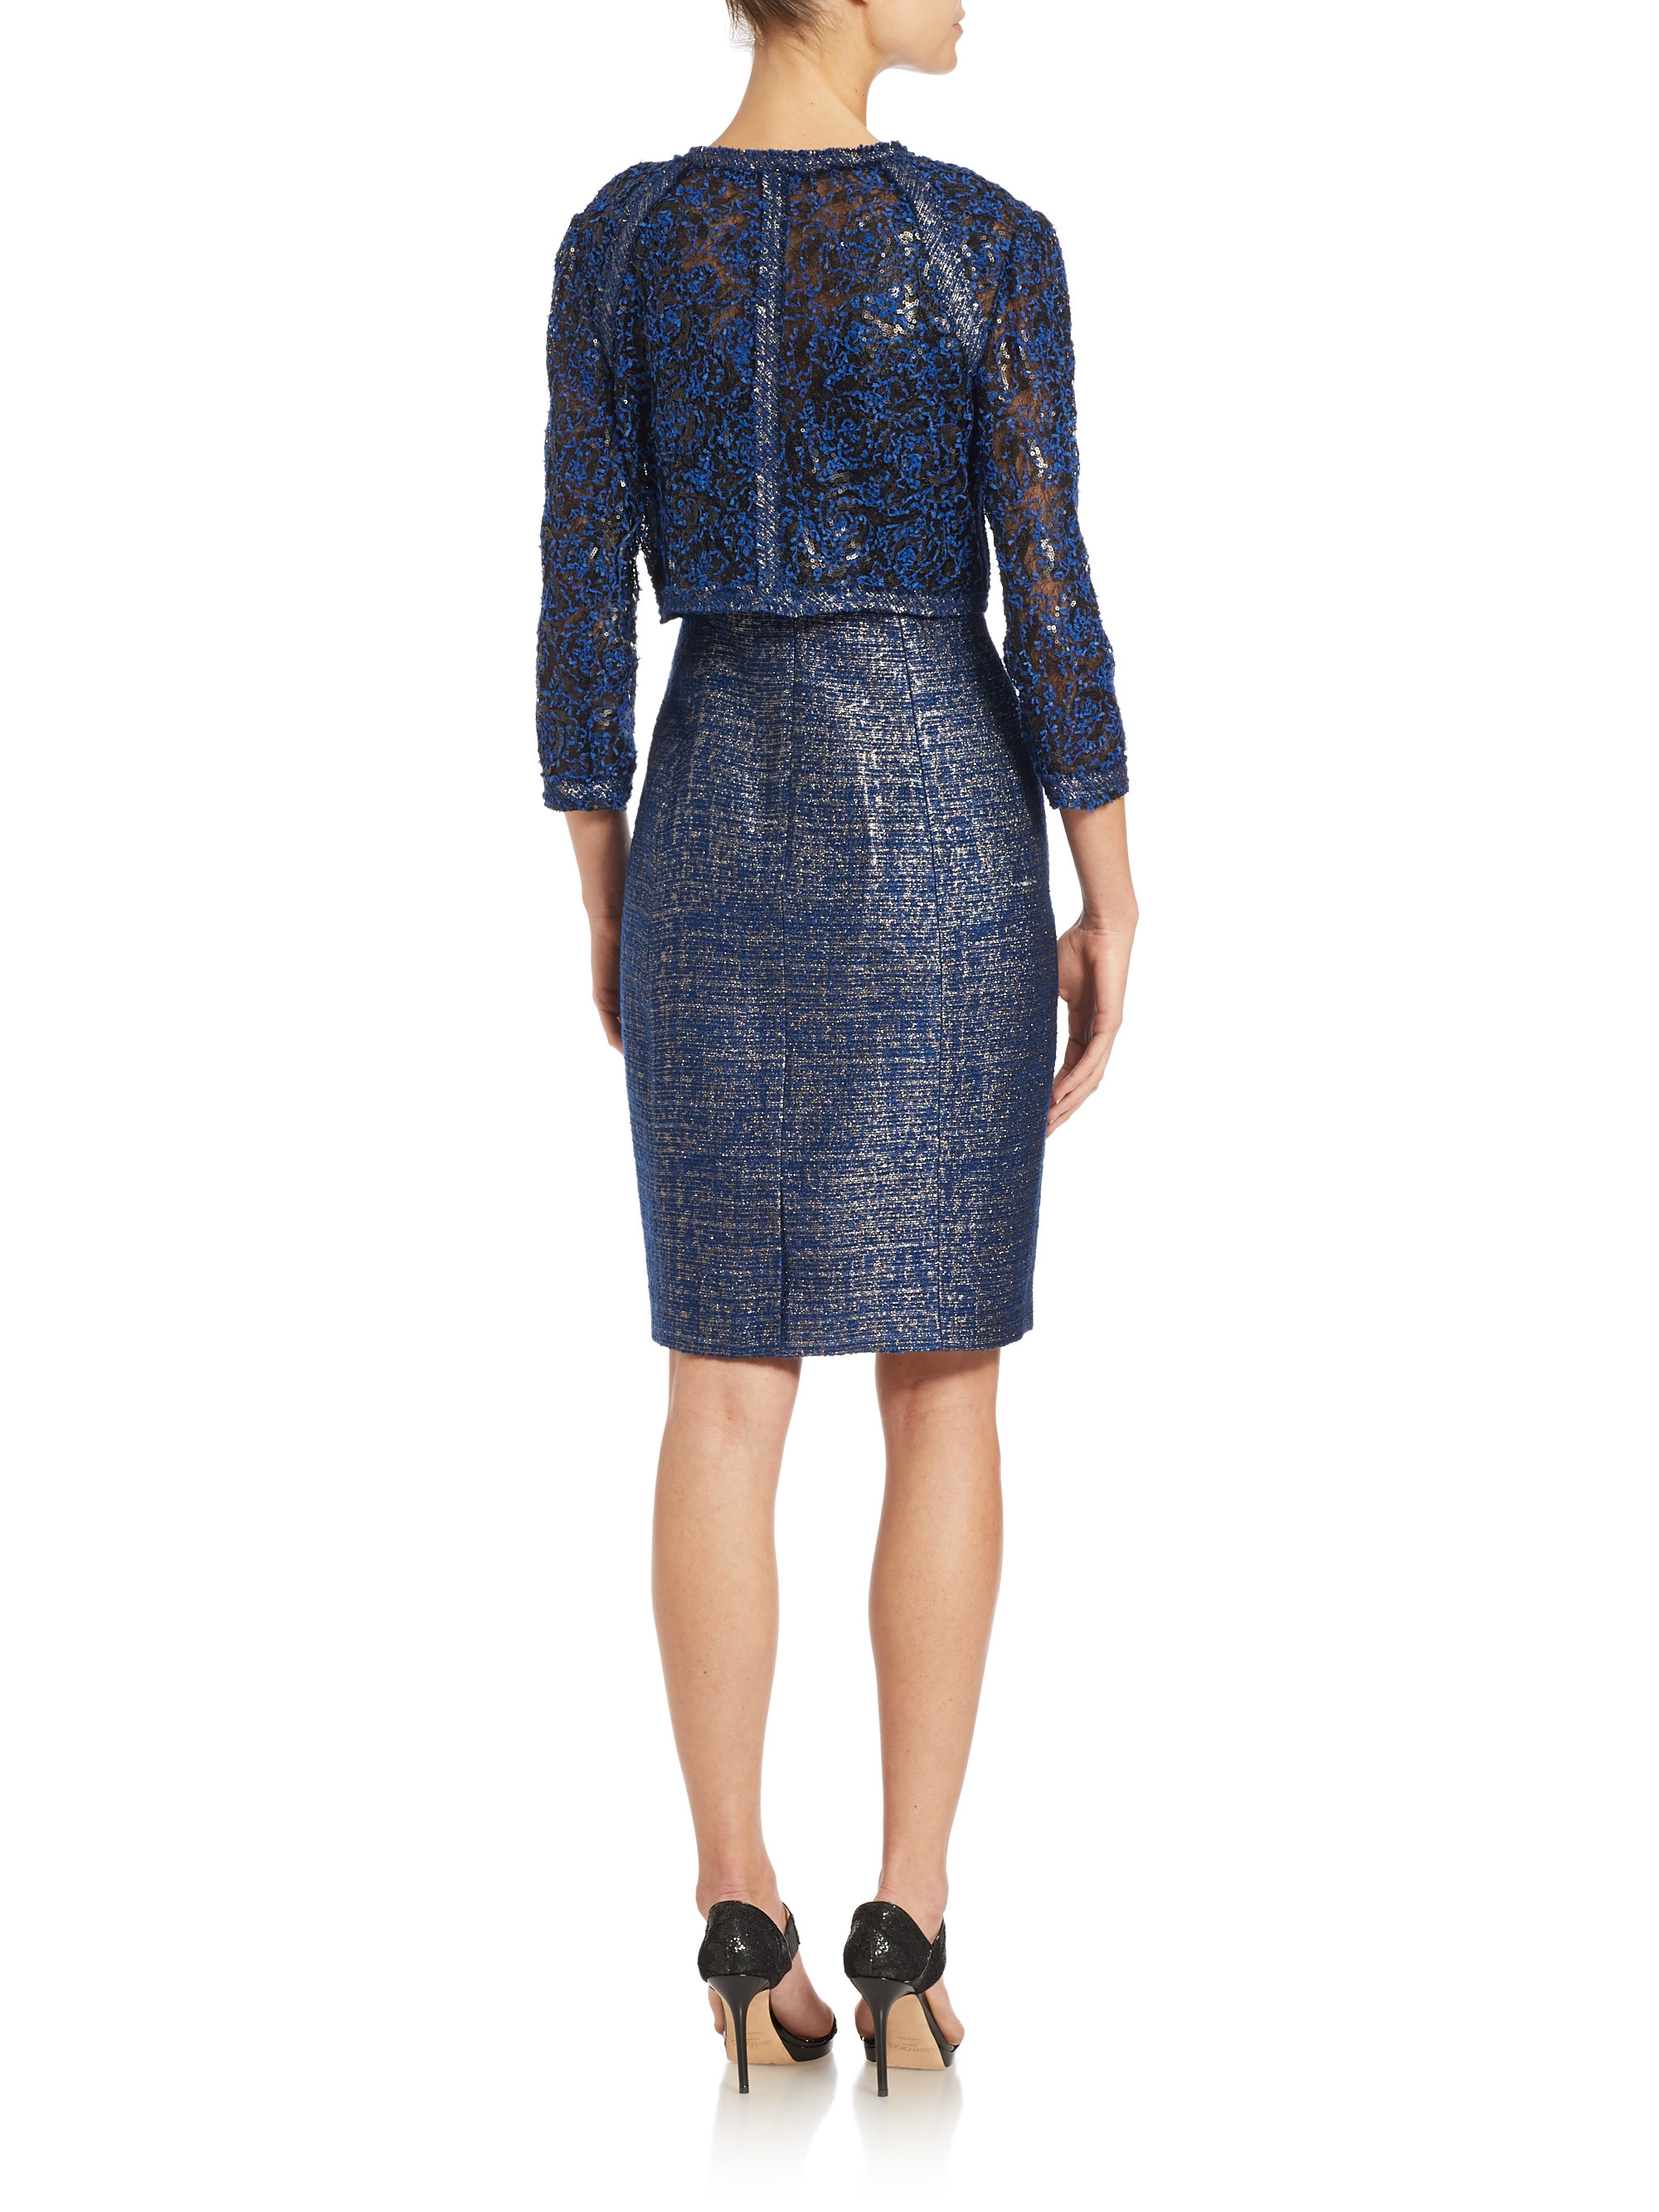 Kay unger Metallic Tweed Dress And Jacket Set in Blue | Lyst